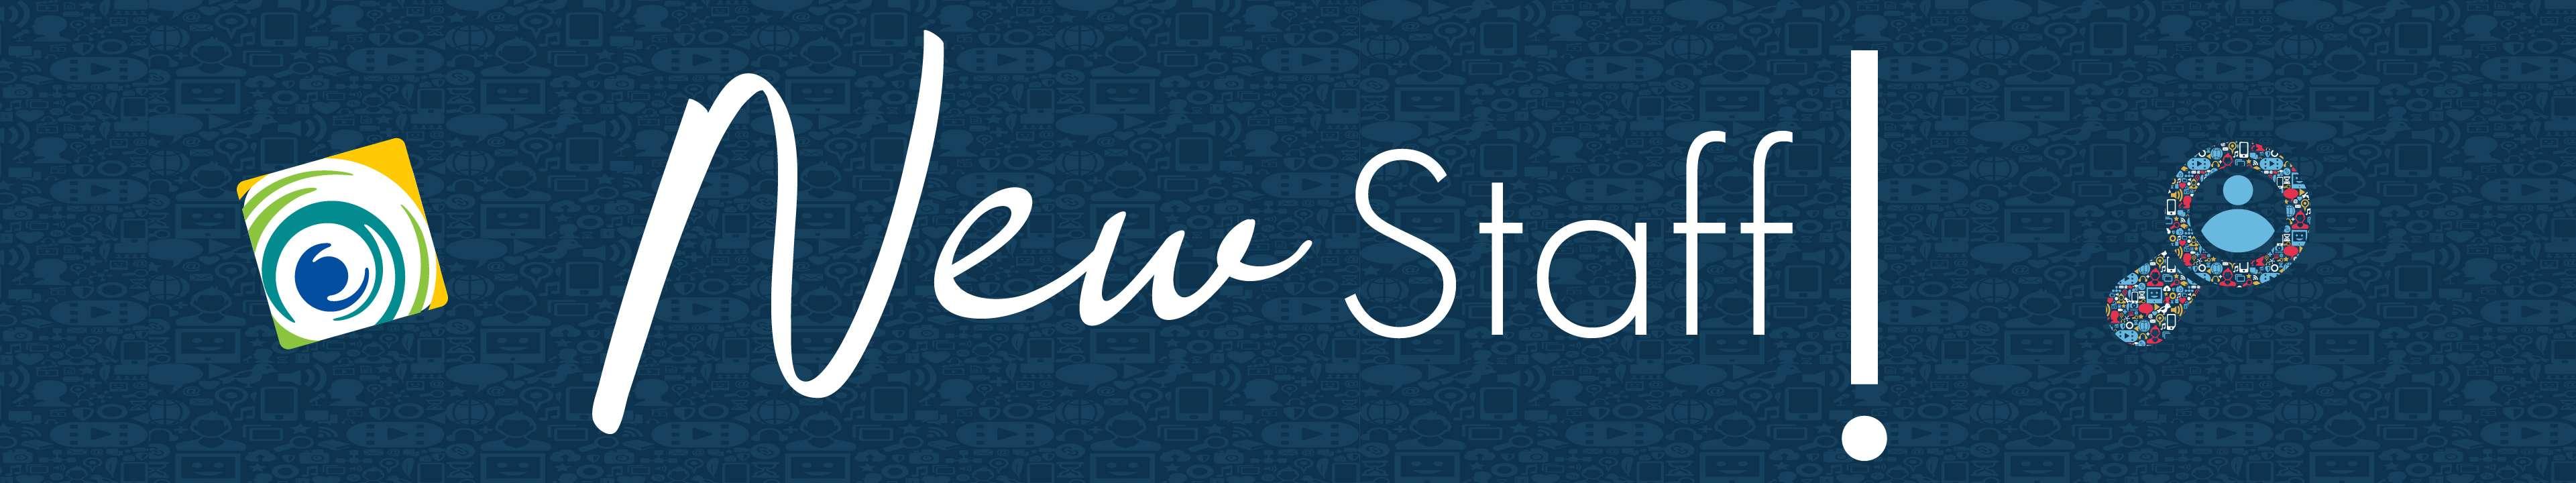 new-staff-4brd-dq2019-slim-banner